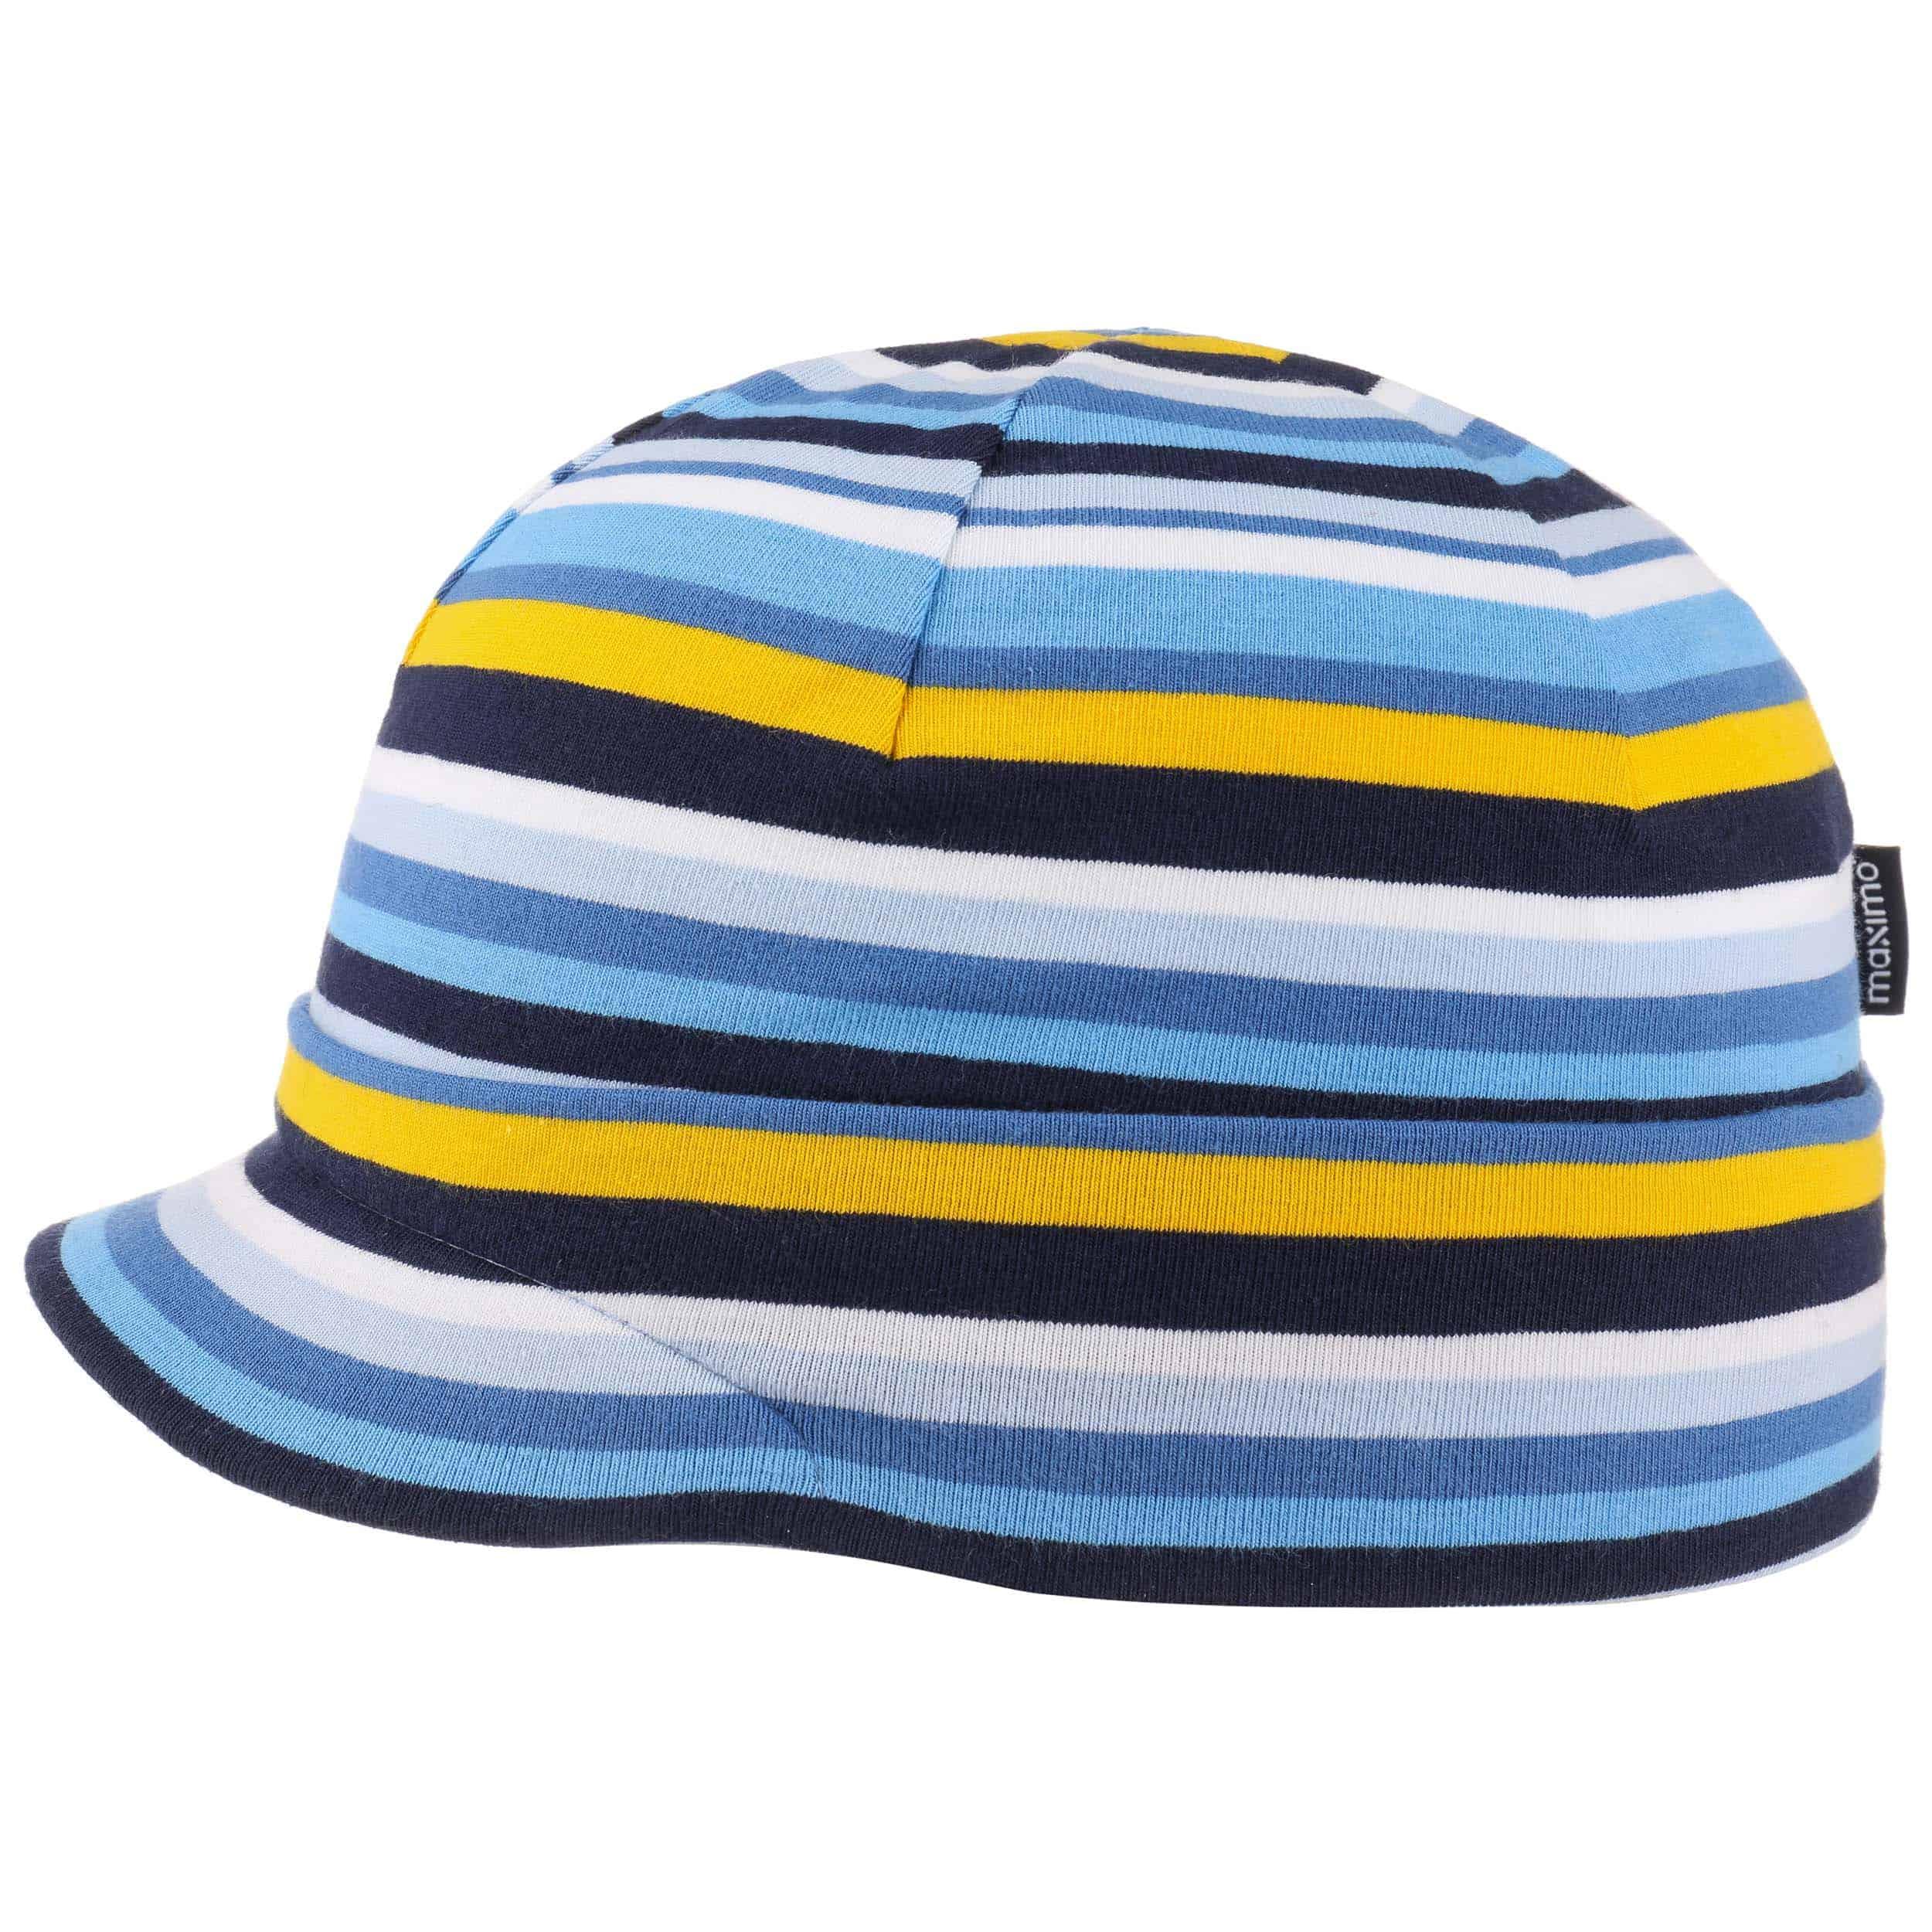 e812a1d1396 ... Jersey Stripes Kids Peak Hat by maximo - blue 4